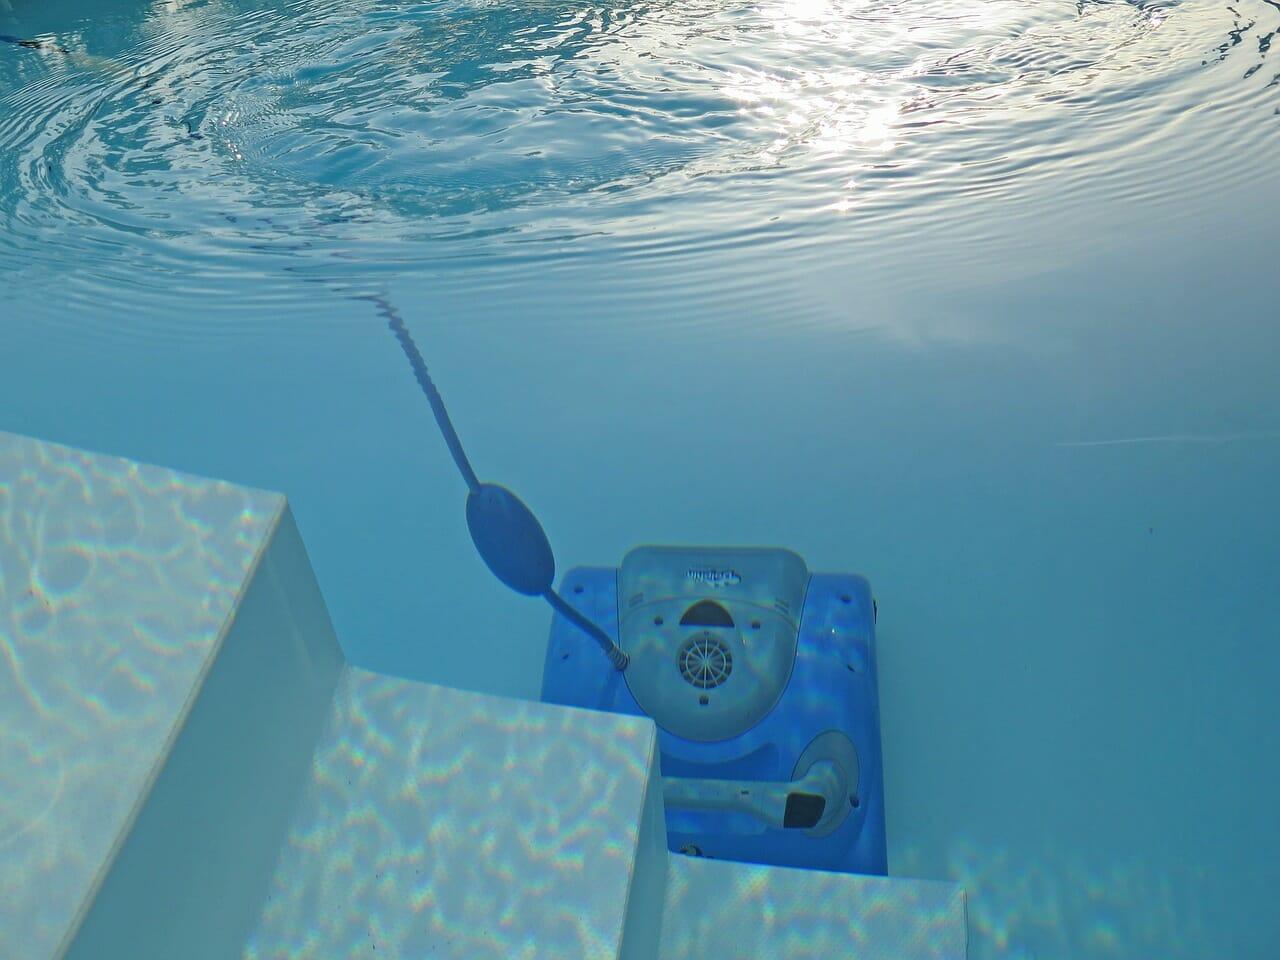 Piccoli nuotatori robotici:1